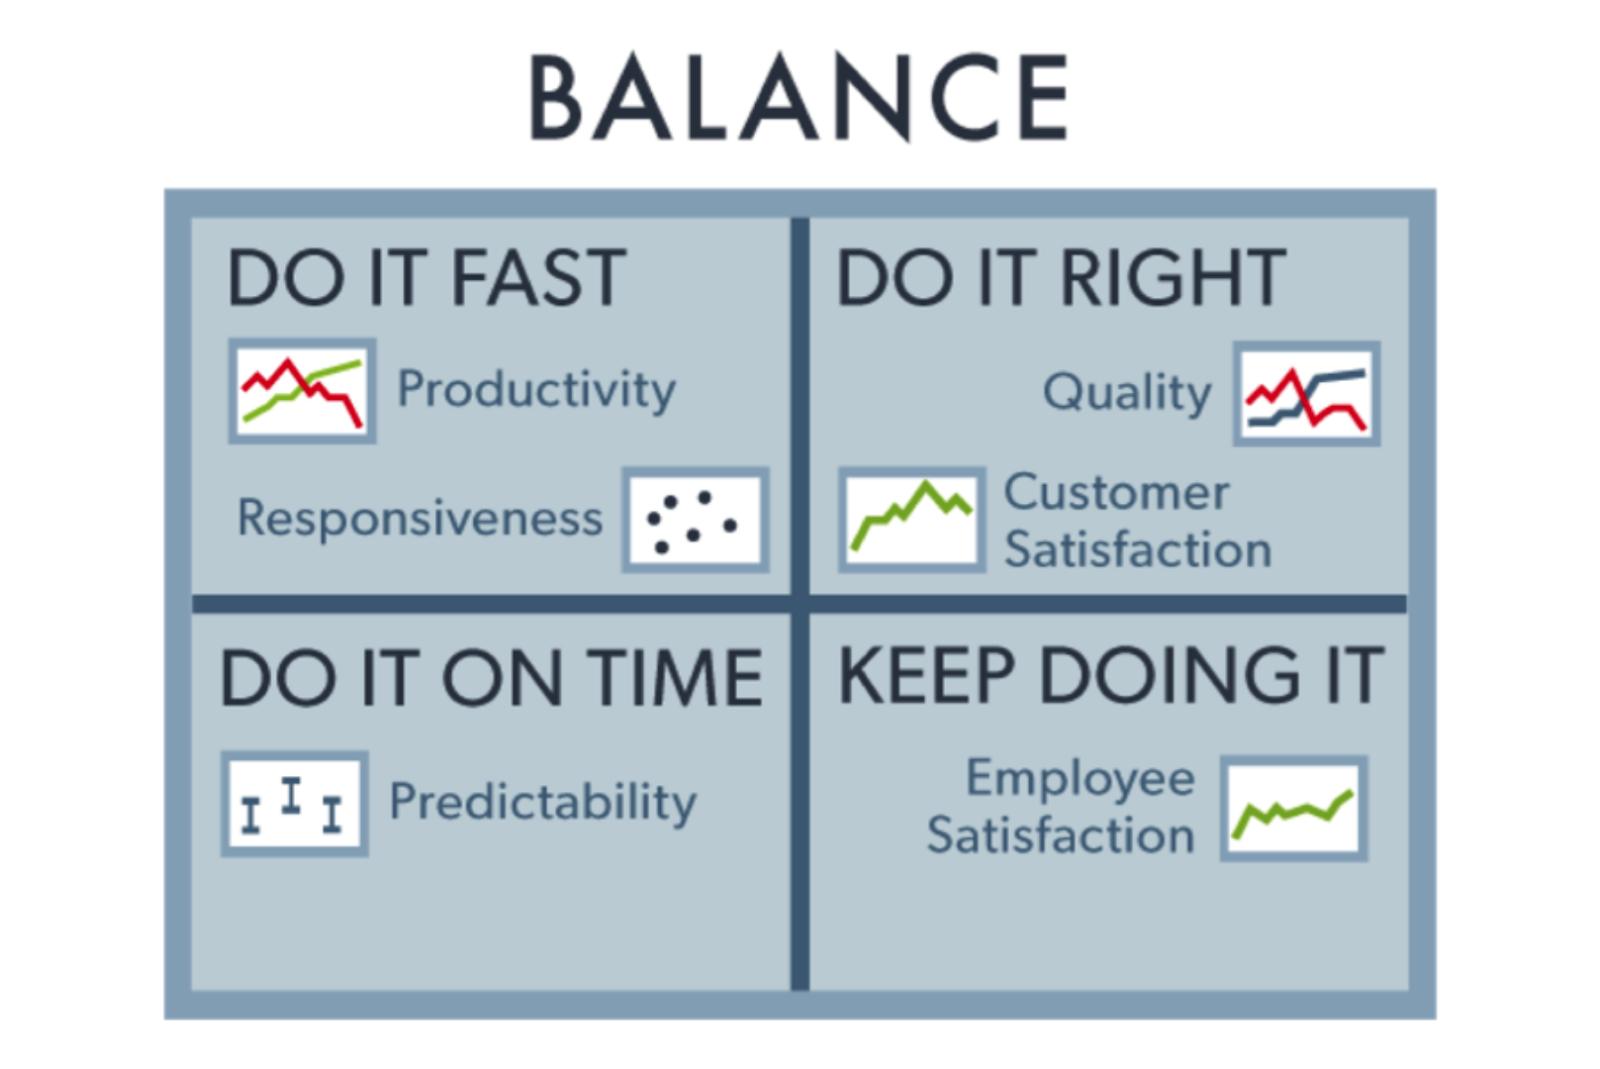 Risks of poor productivity in software development